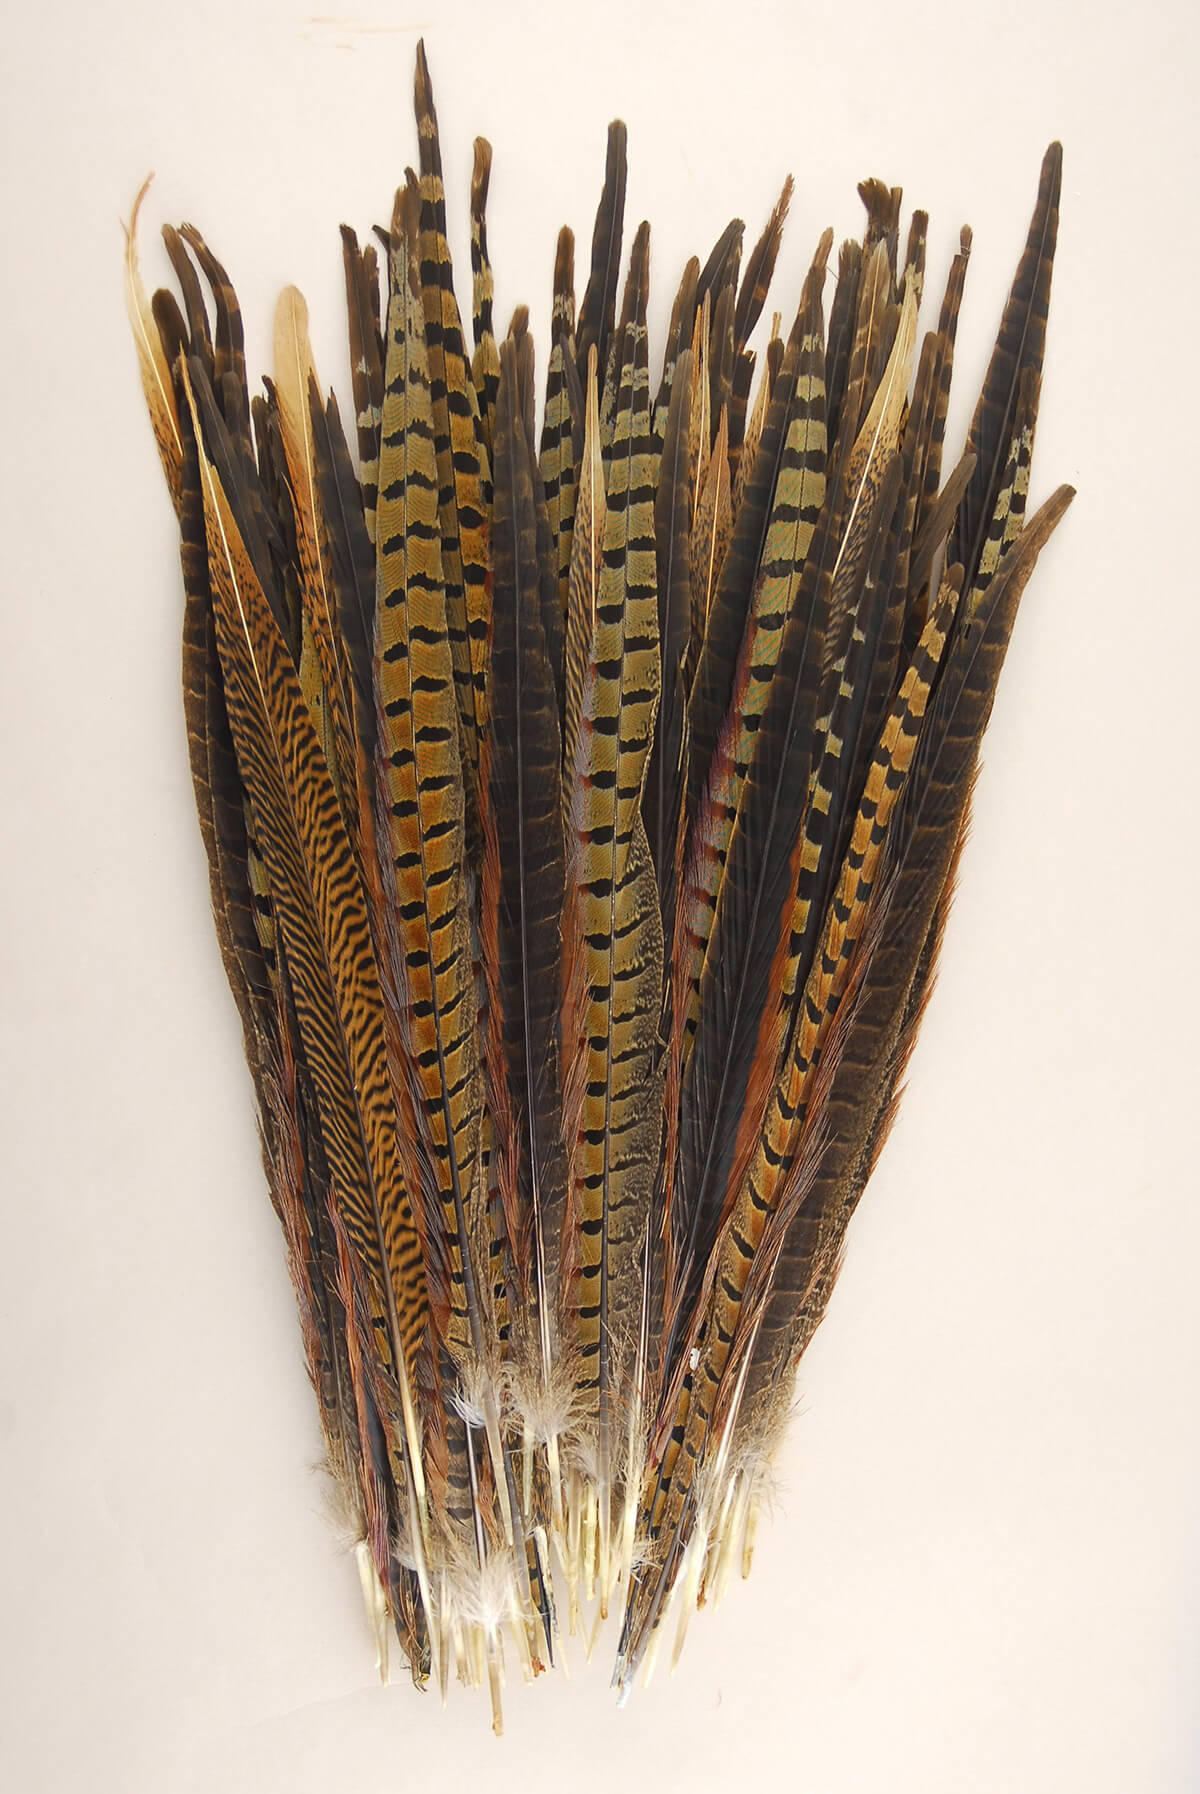 Feather photo